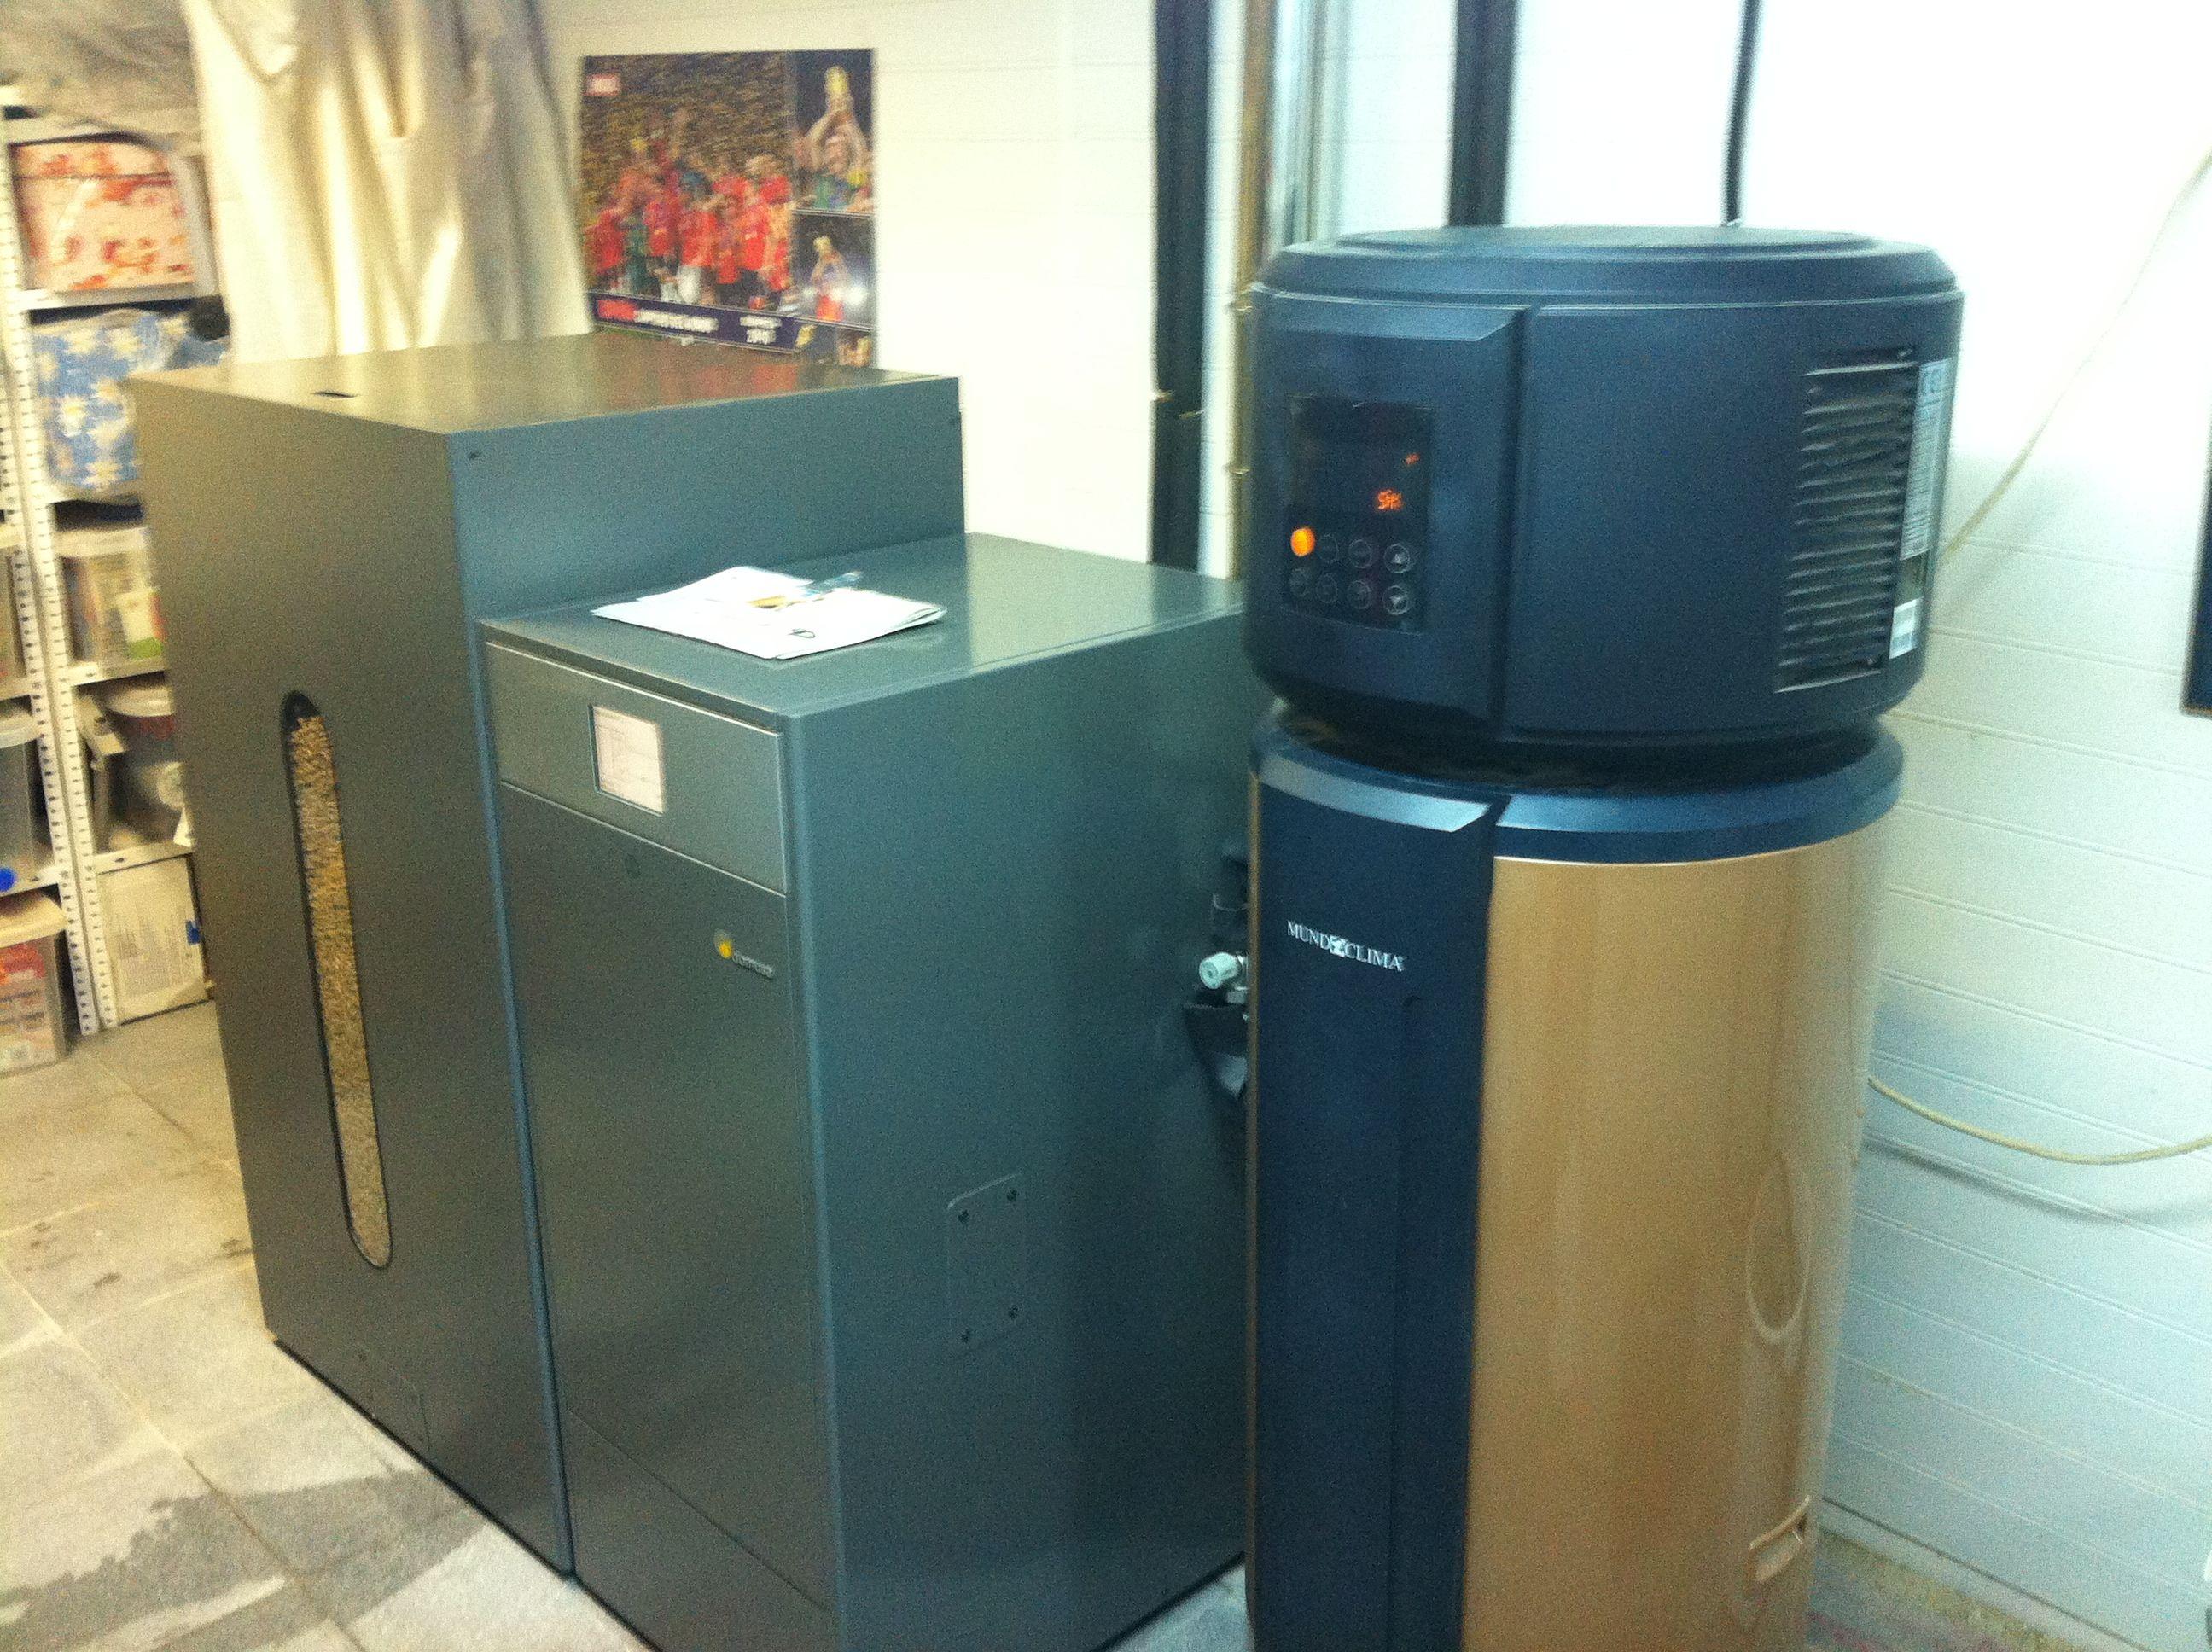 Instalaci n domusa bioclass y bomba de calor aerot rmica for Calderas de pellets domusa